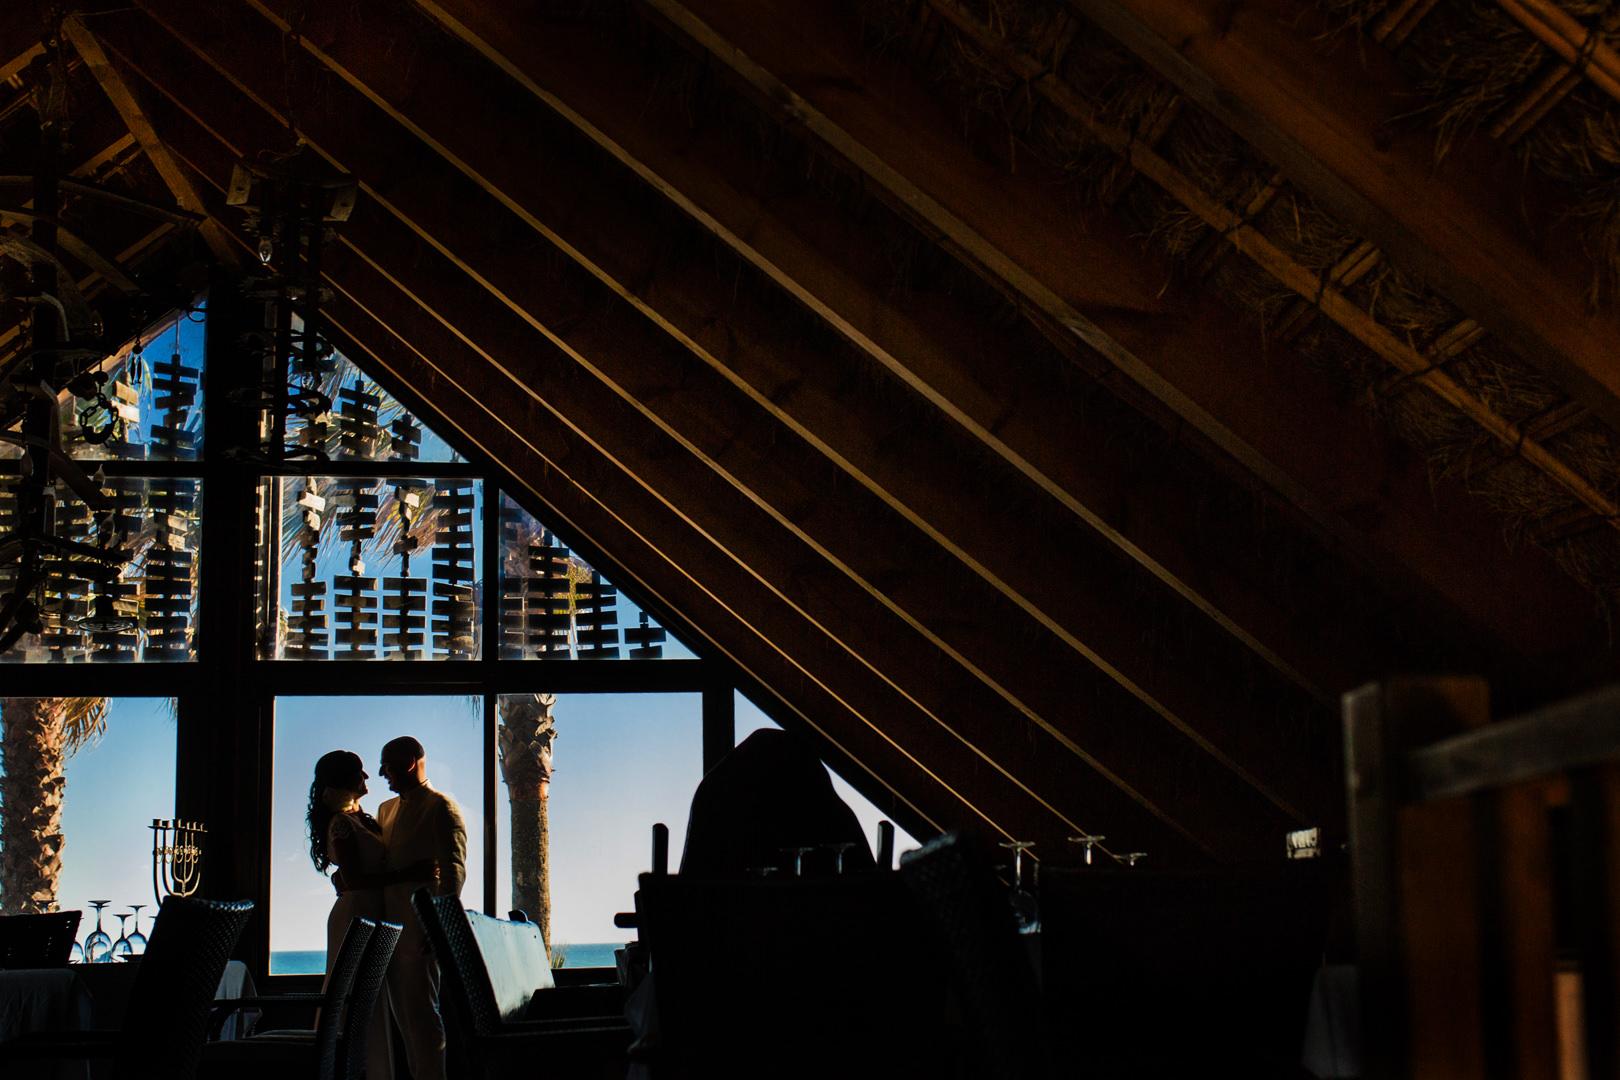 Boda-Sajorami-Beach-Cadiz-Zahora-Pedro-Gema-engagement-Rafael-Torres-fotografo-bodas-sevilla-madrid-barcelona-wedding-photographer--34.jpg